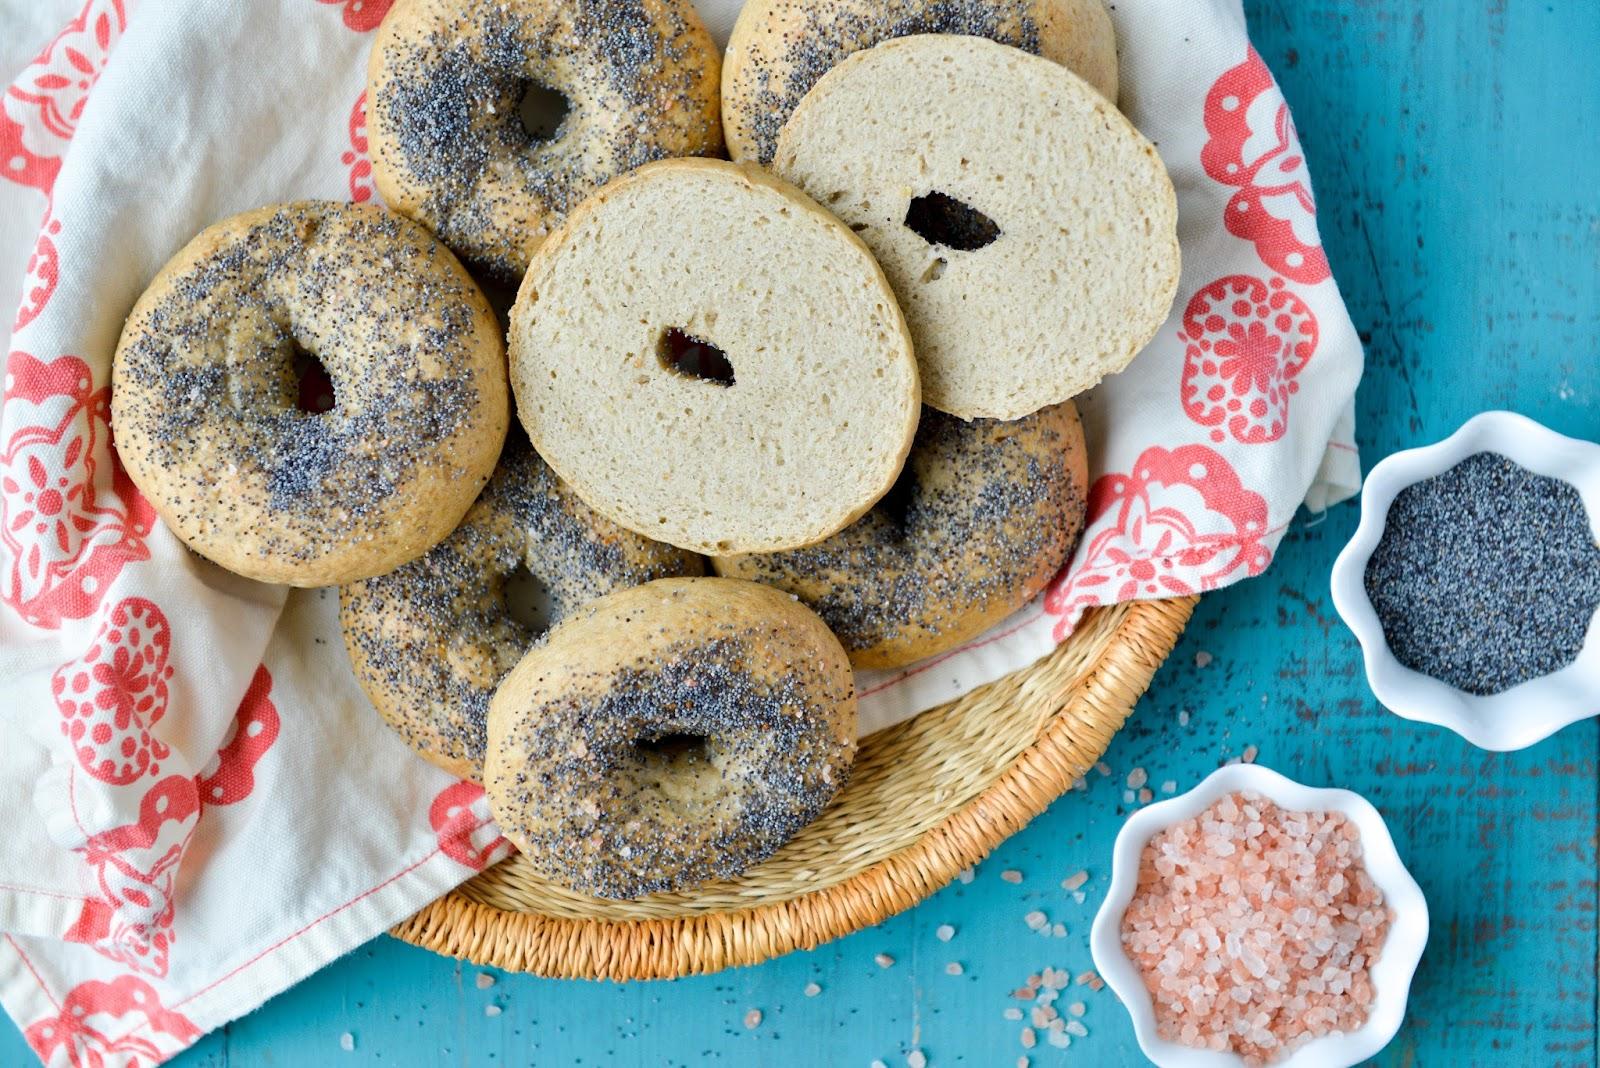 Nourishing Meals®: Gluten-Free Bagel Recipe (vegan ...